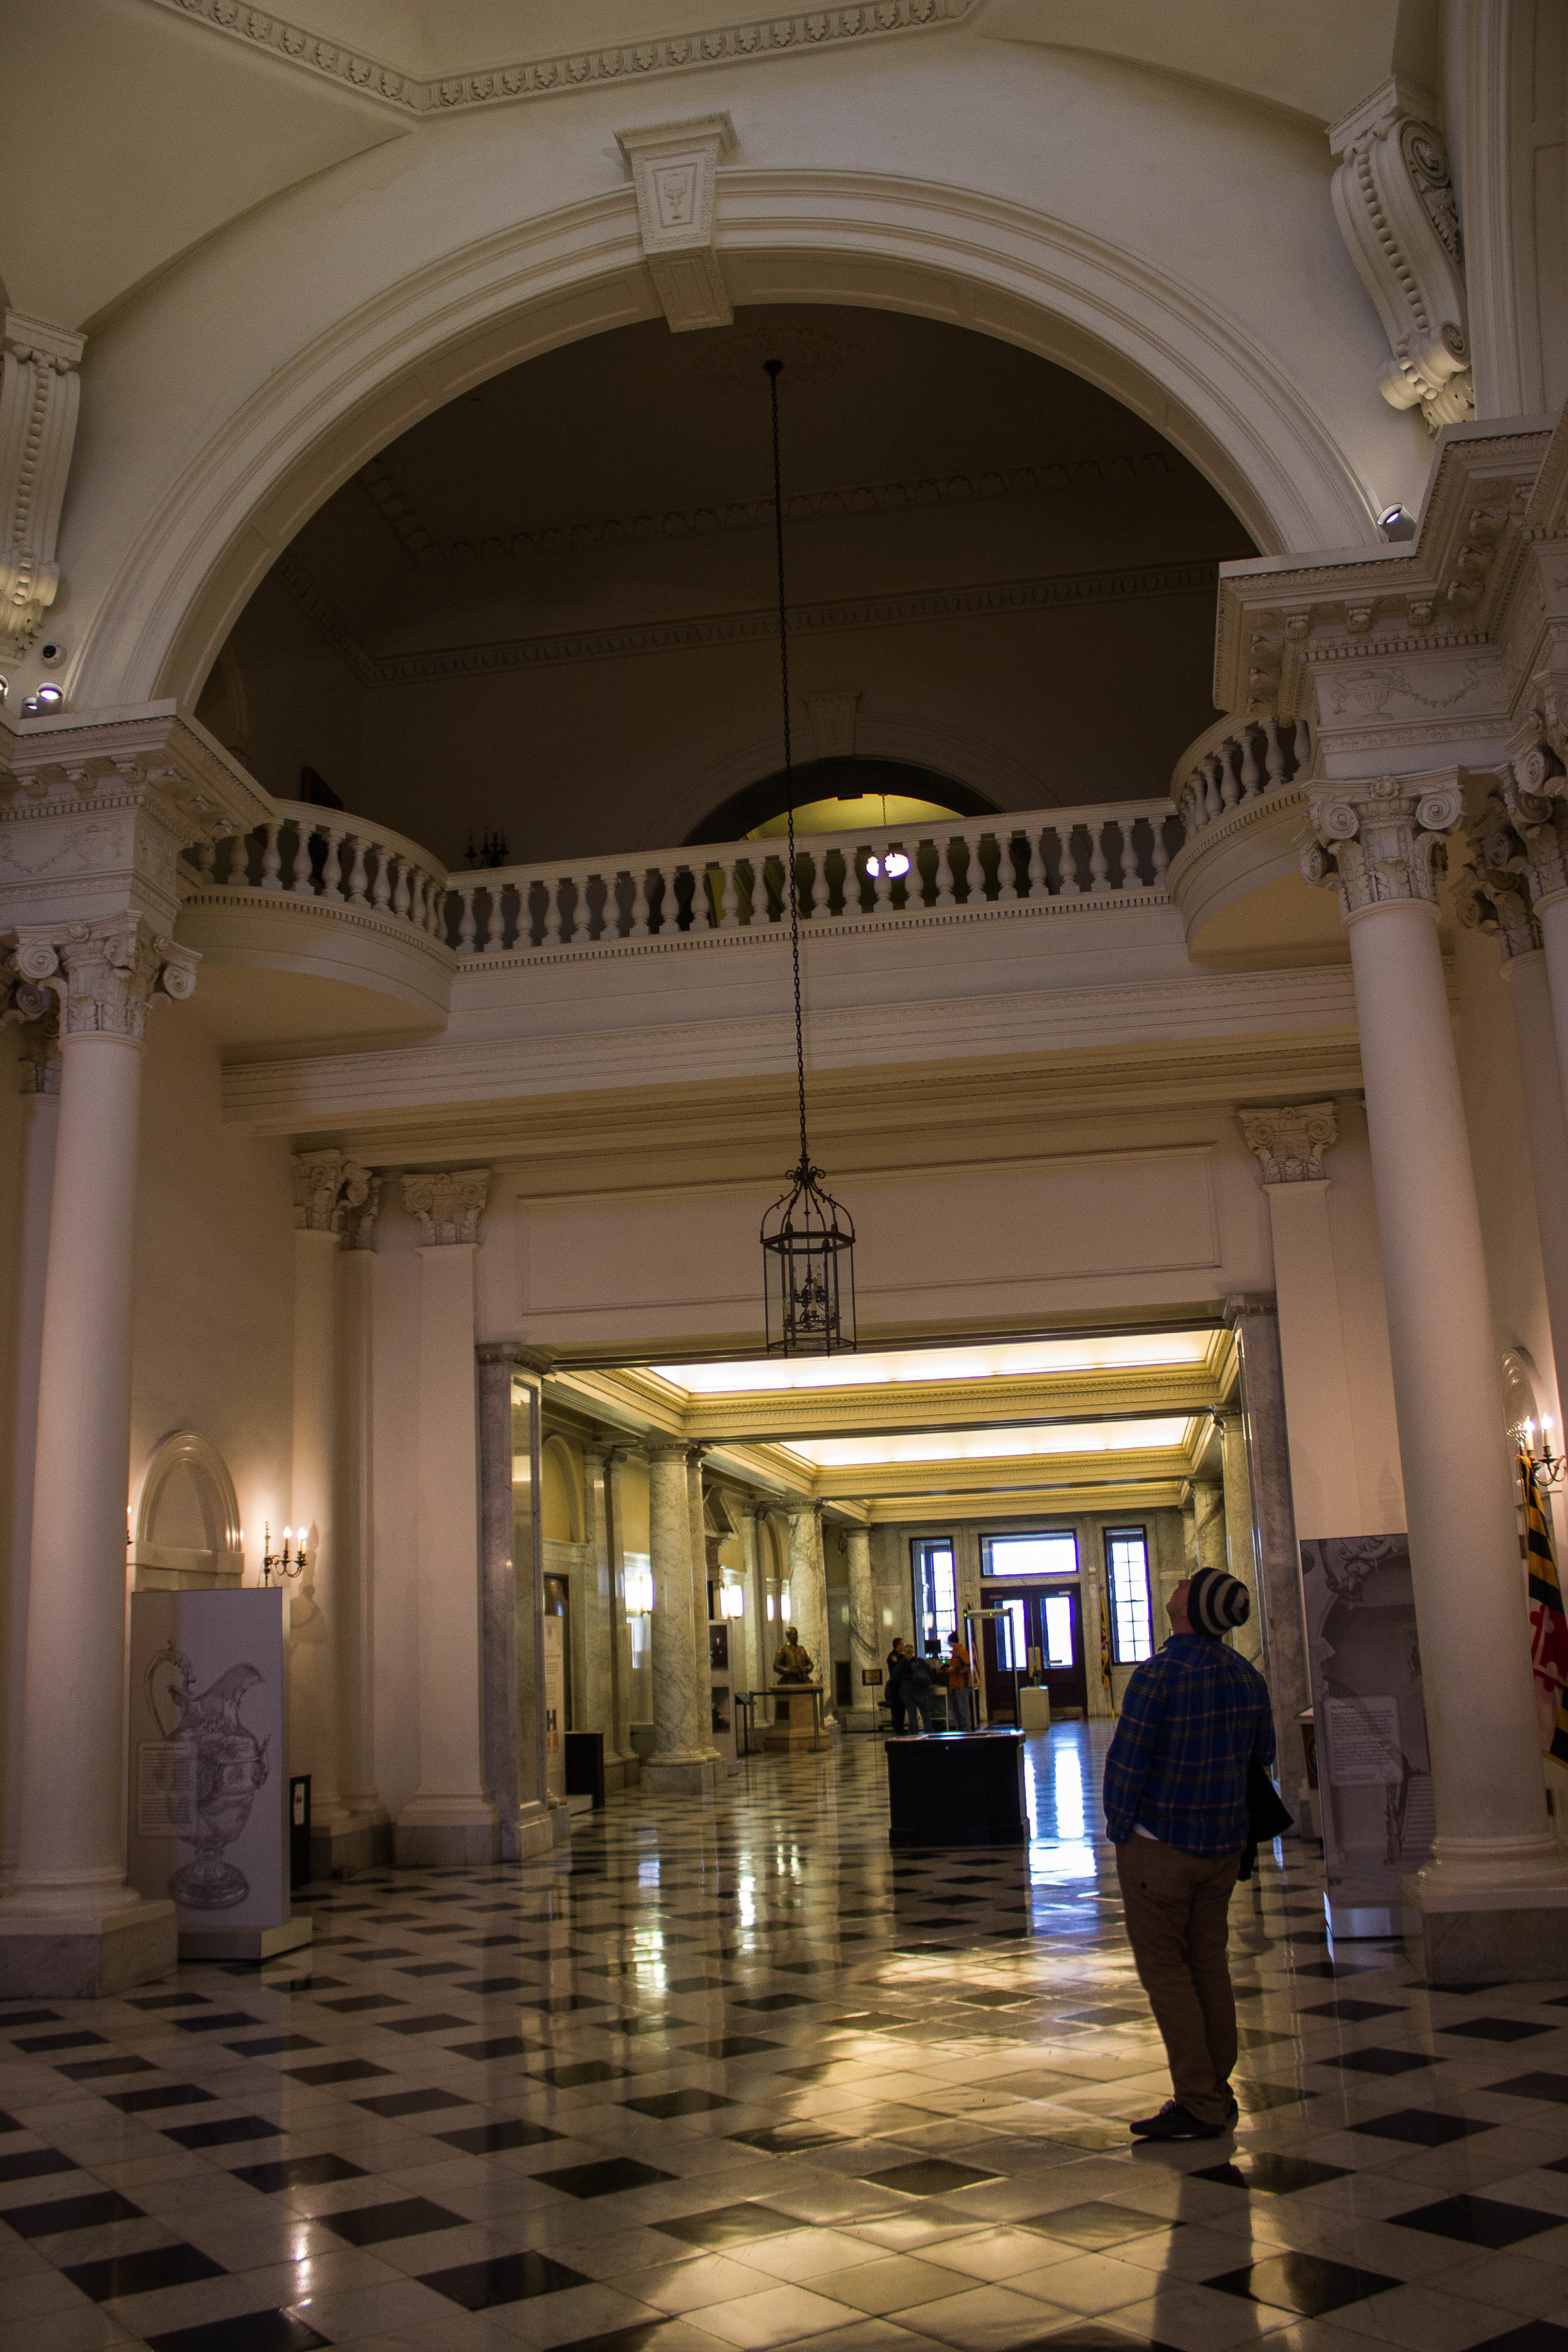 annapolis-state-house-interior.jpg